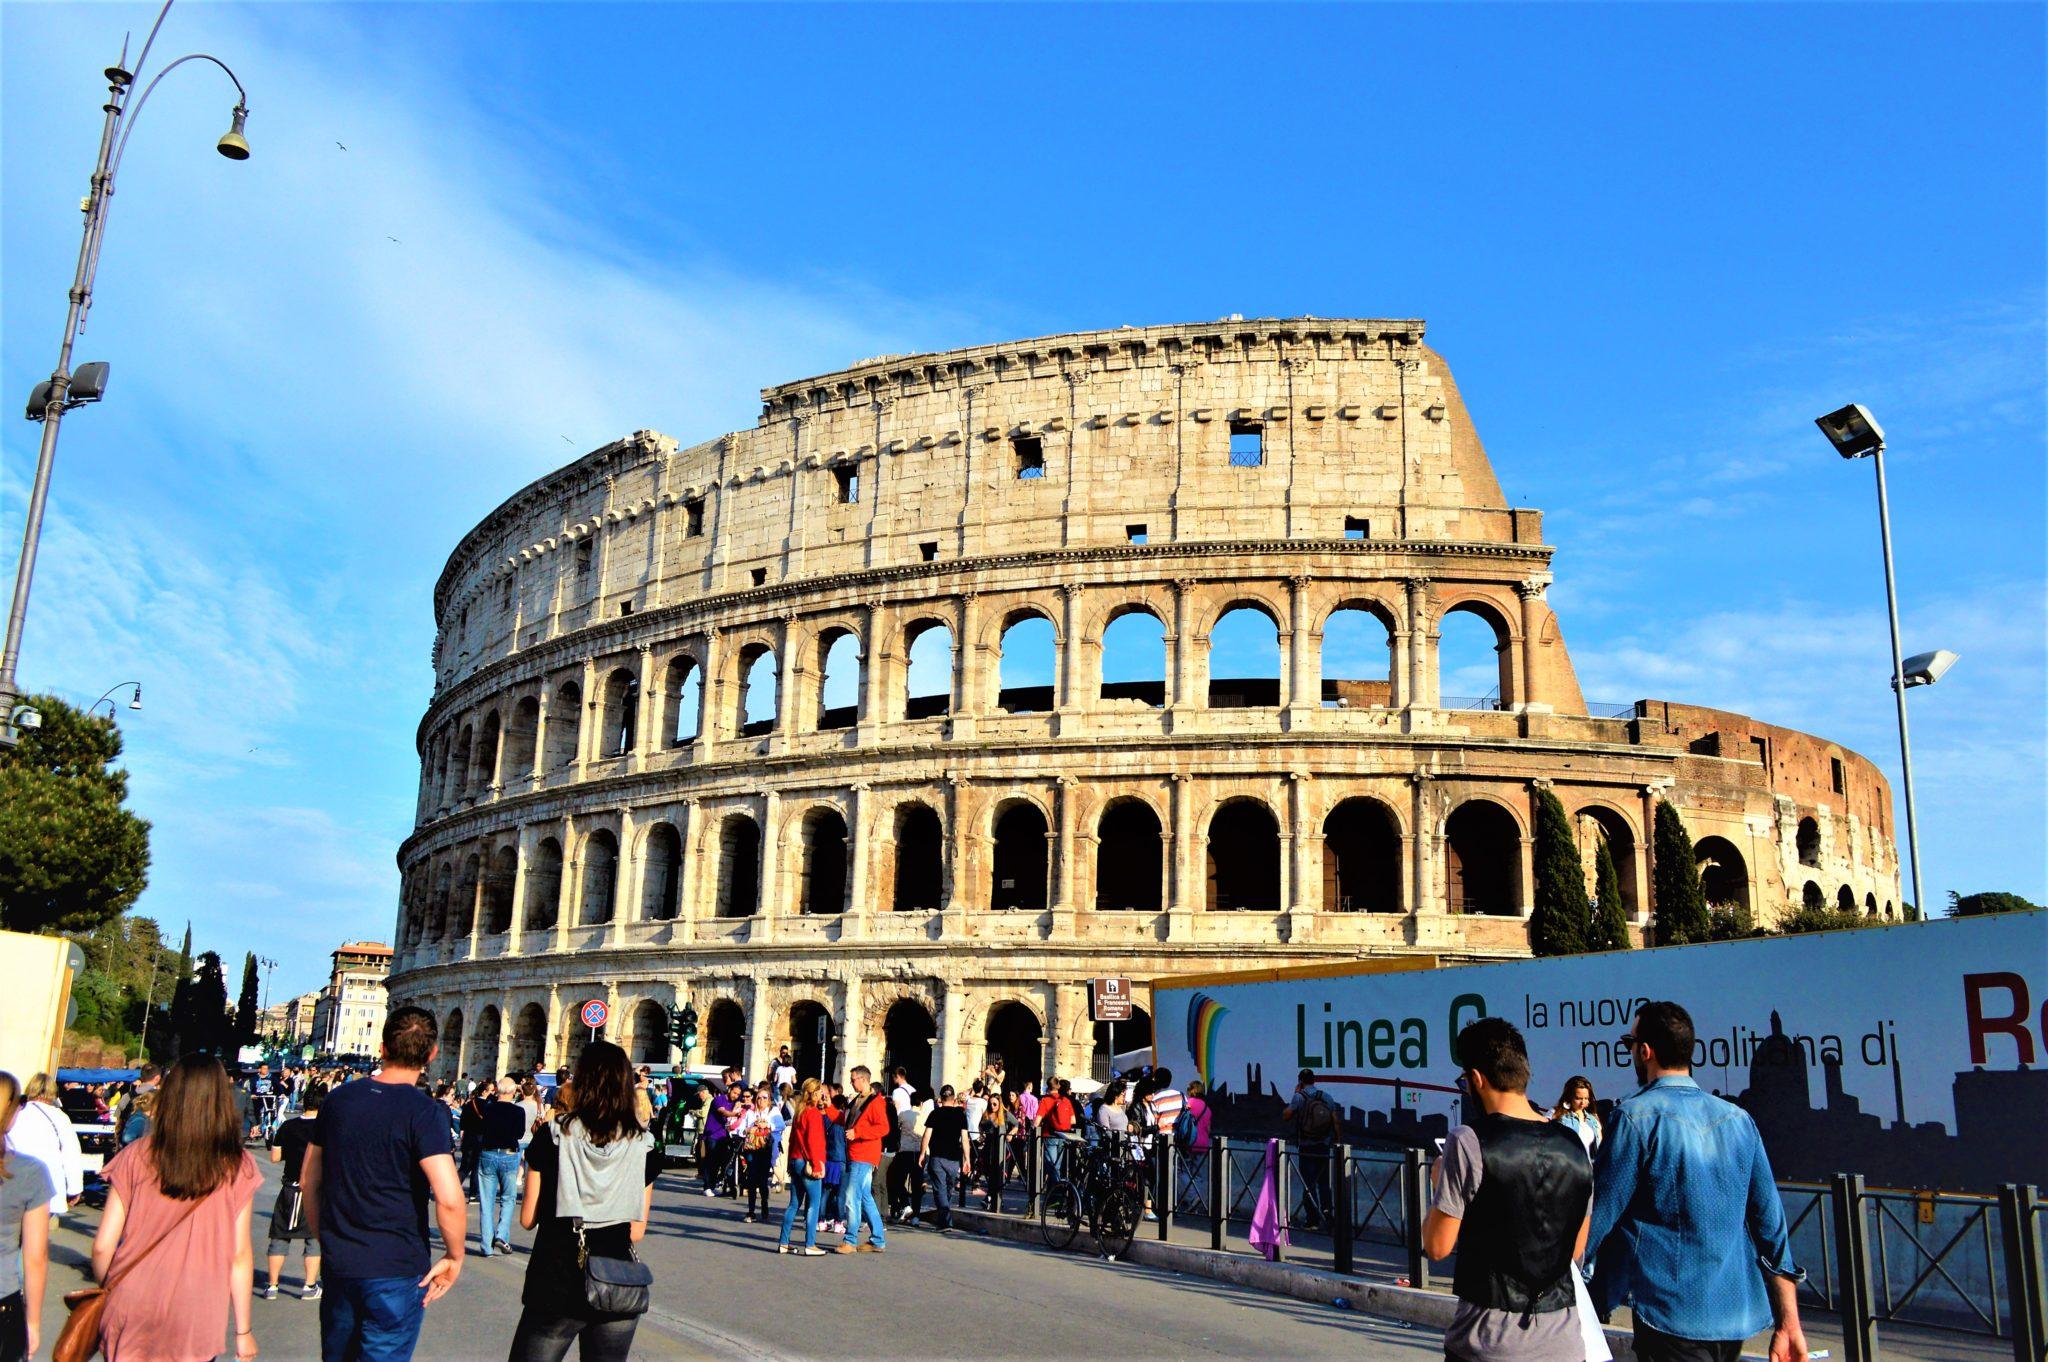 Outside the Roman Colosseum, Rome, Italy